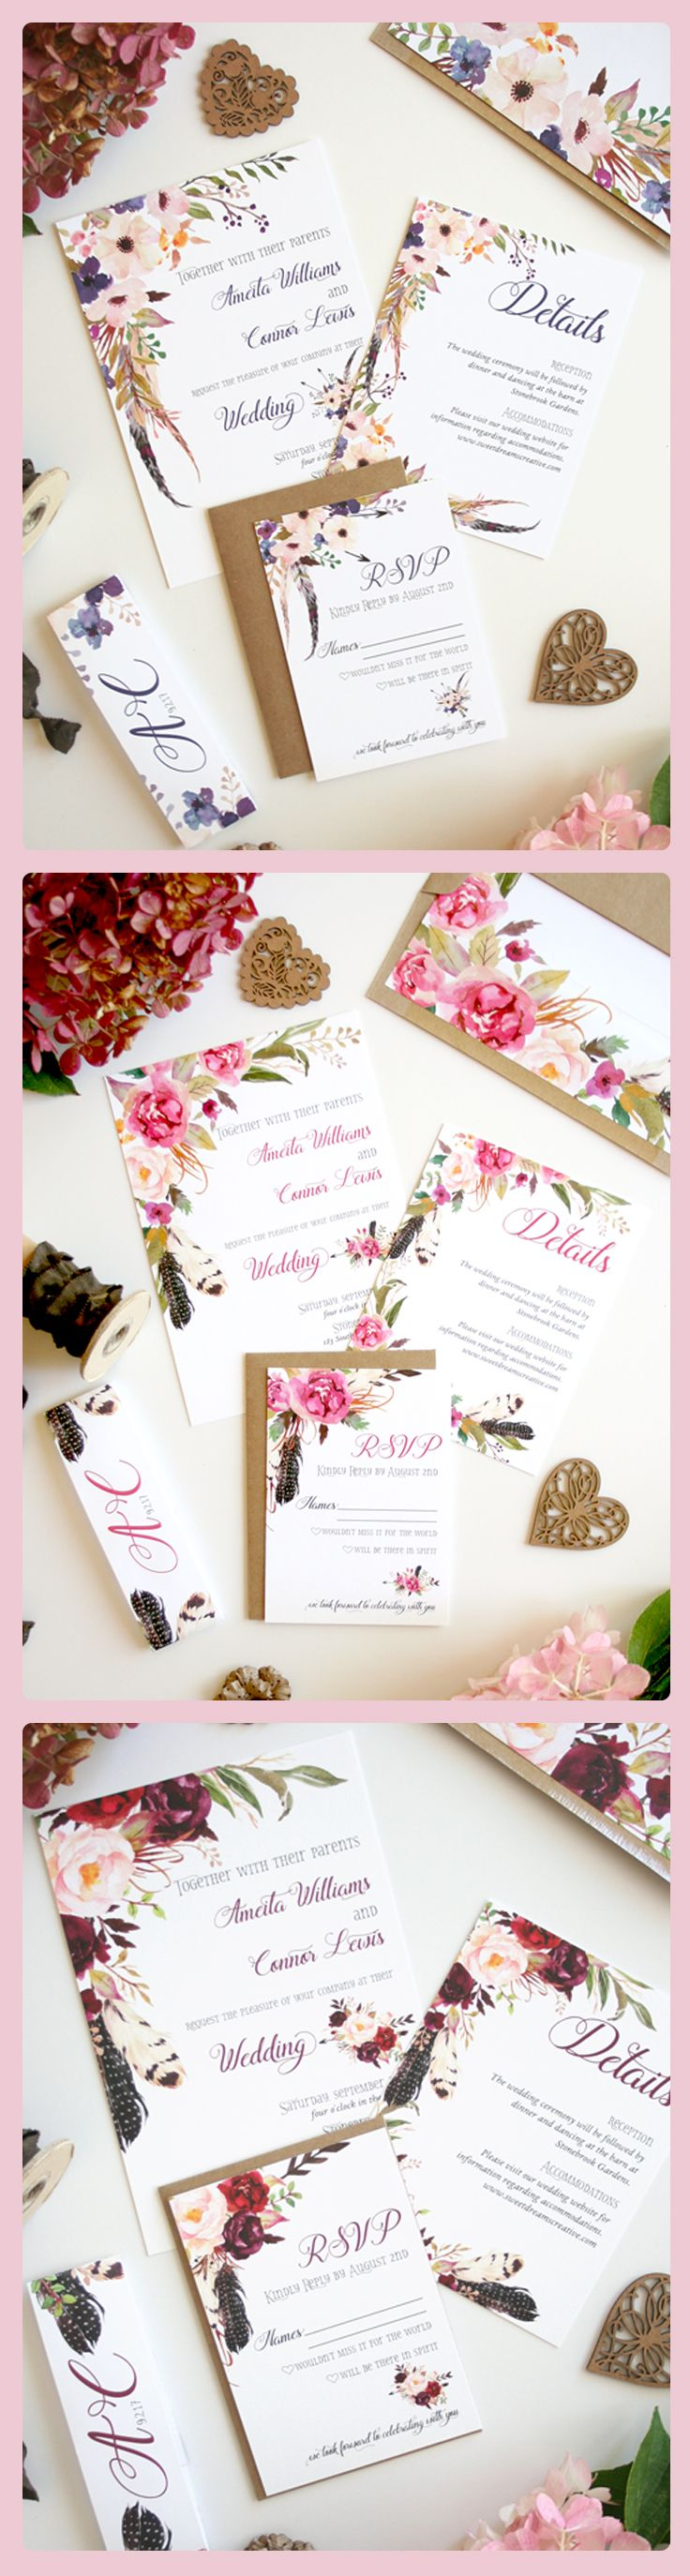 avery address labels wedding invitations%0A Boho Chic Wedding Invitations